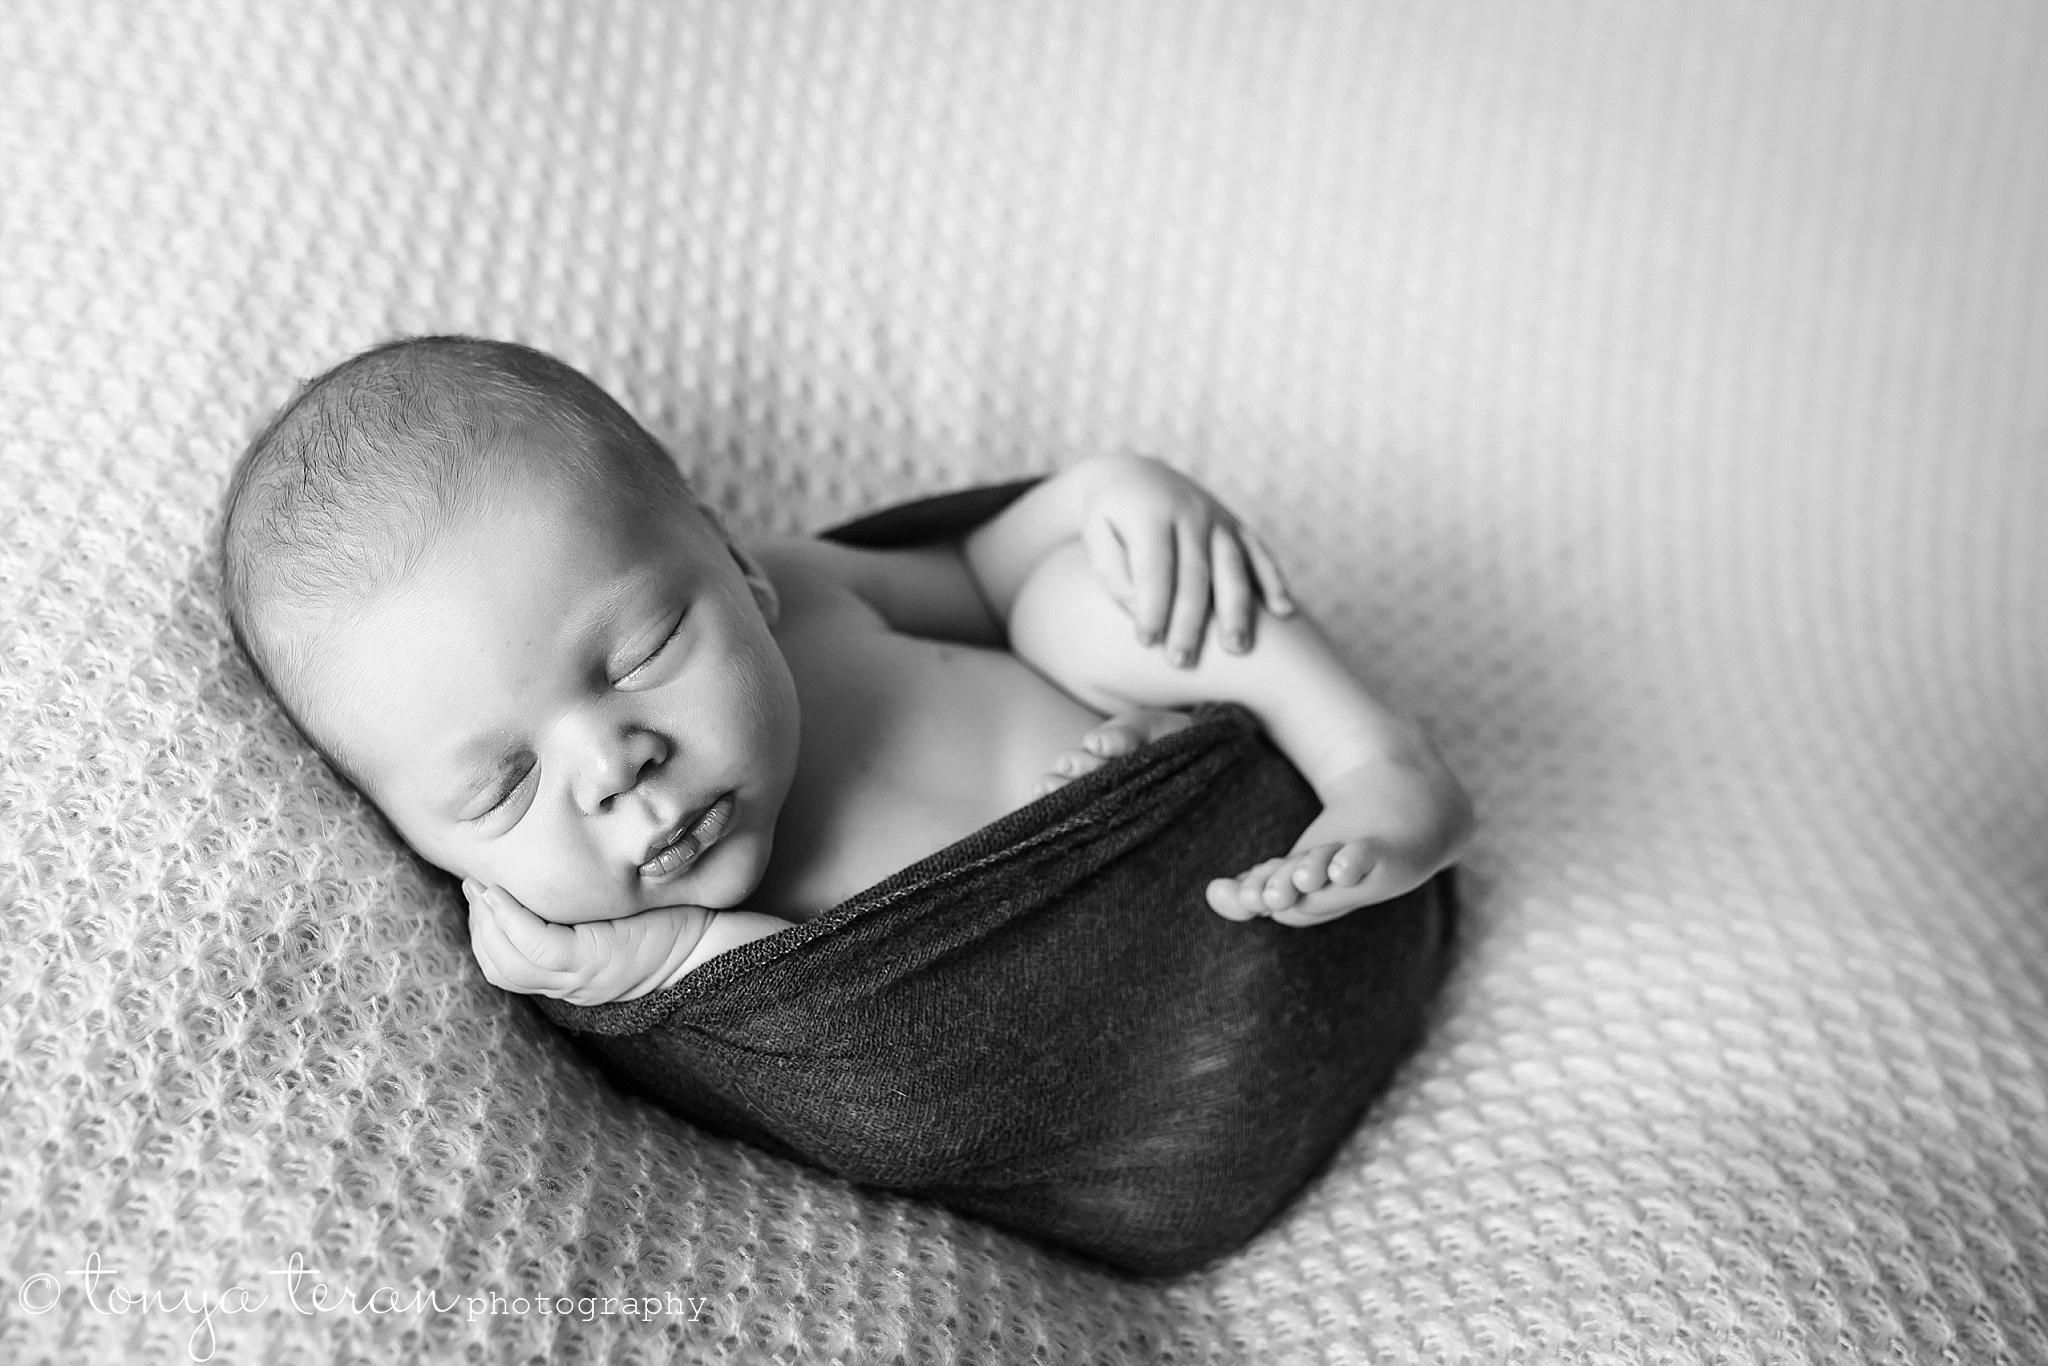 Newborn Photo Session | Tonya Teran Photography, McLean, VA Newborn, Baby, and Family Photographer